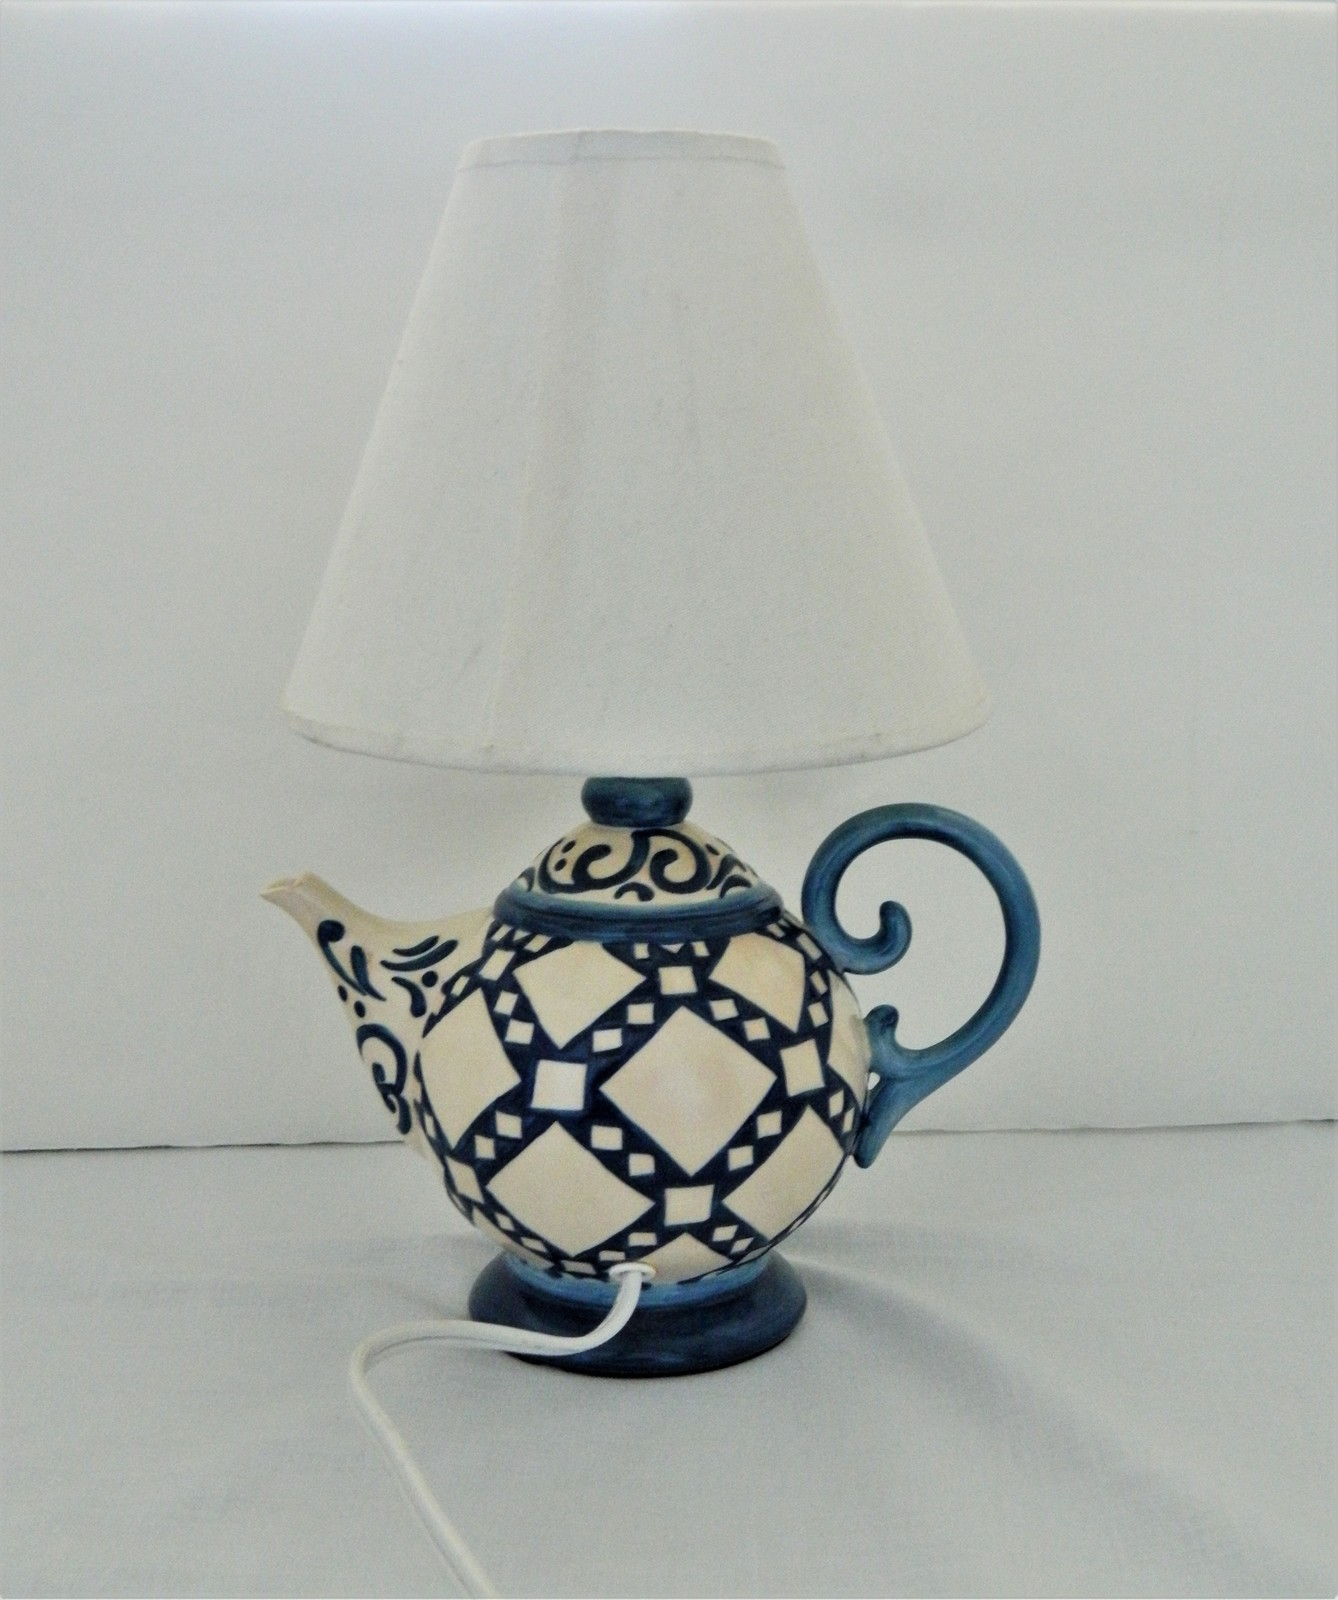 Table/Desk Electric Lamp – Teapot Design – 2004 Jim Shore - Enesco - Ceramic  - $32.50